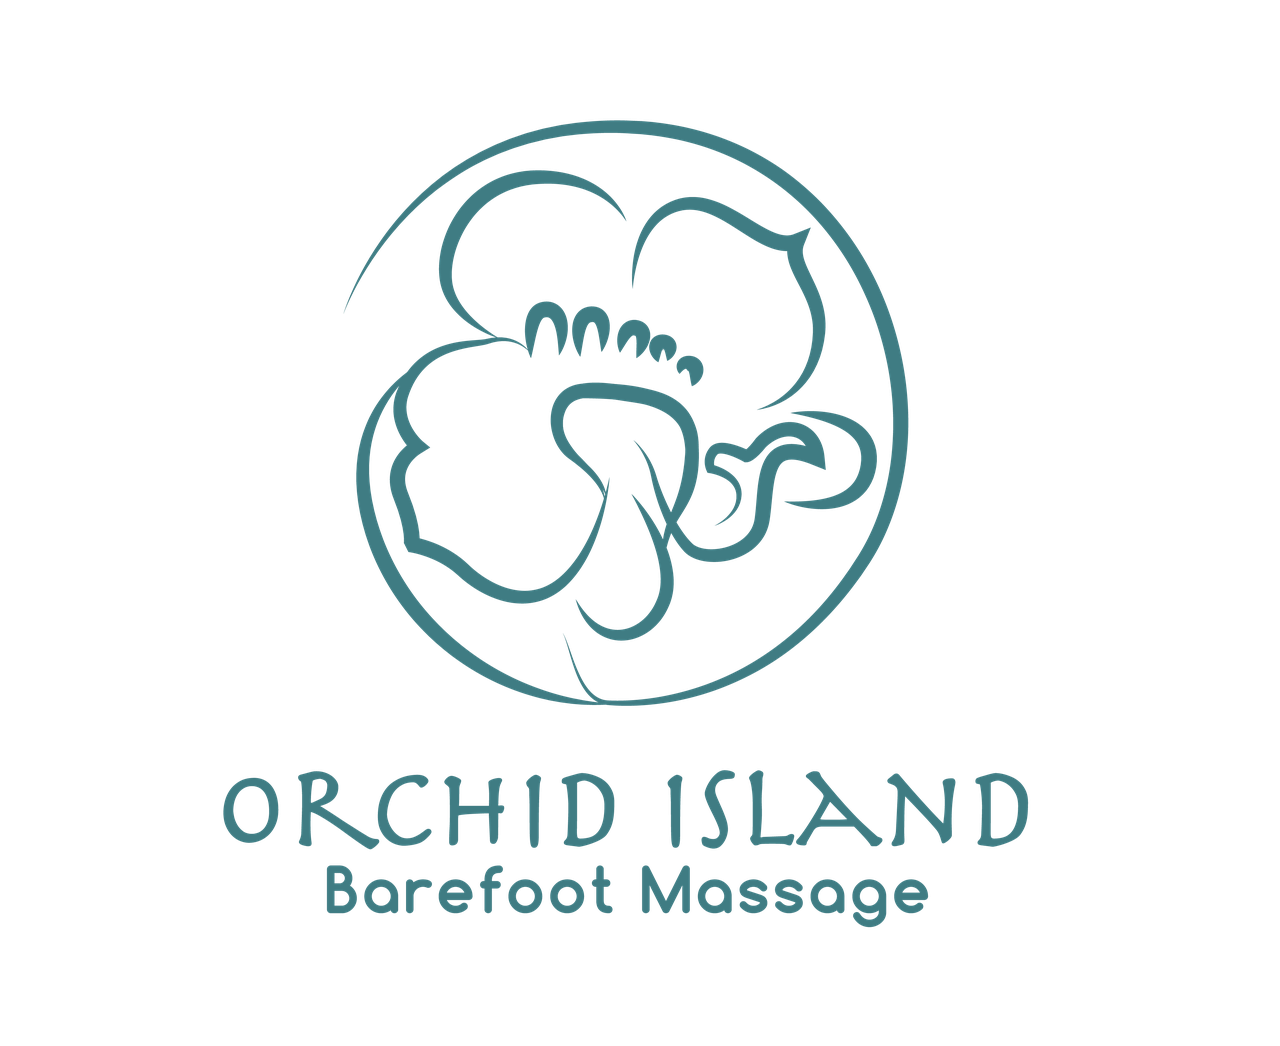 Orchid Island Barefoot Massage